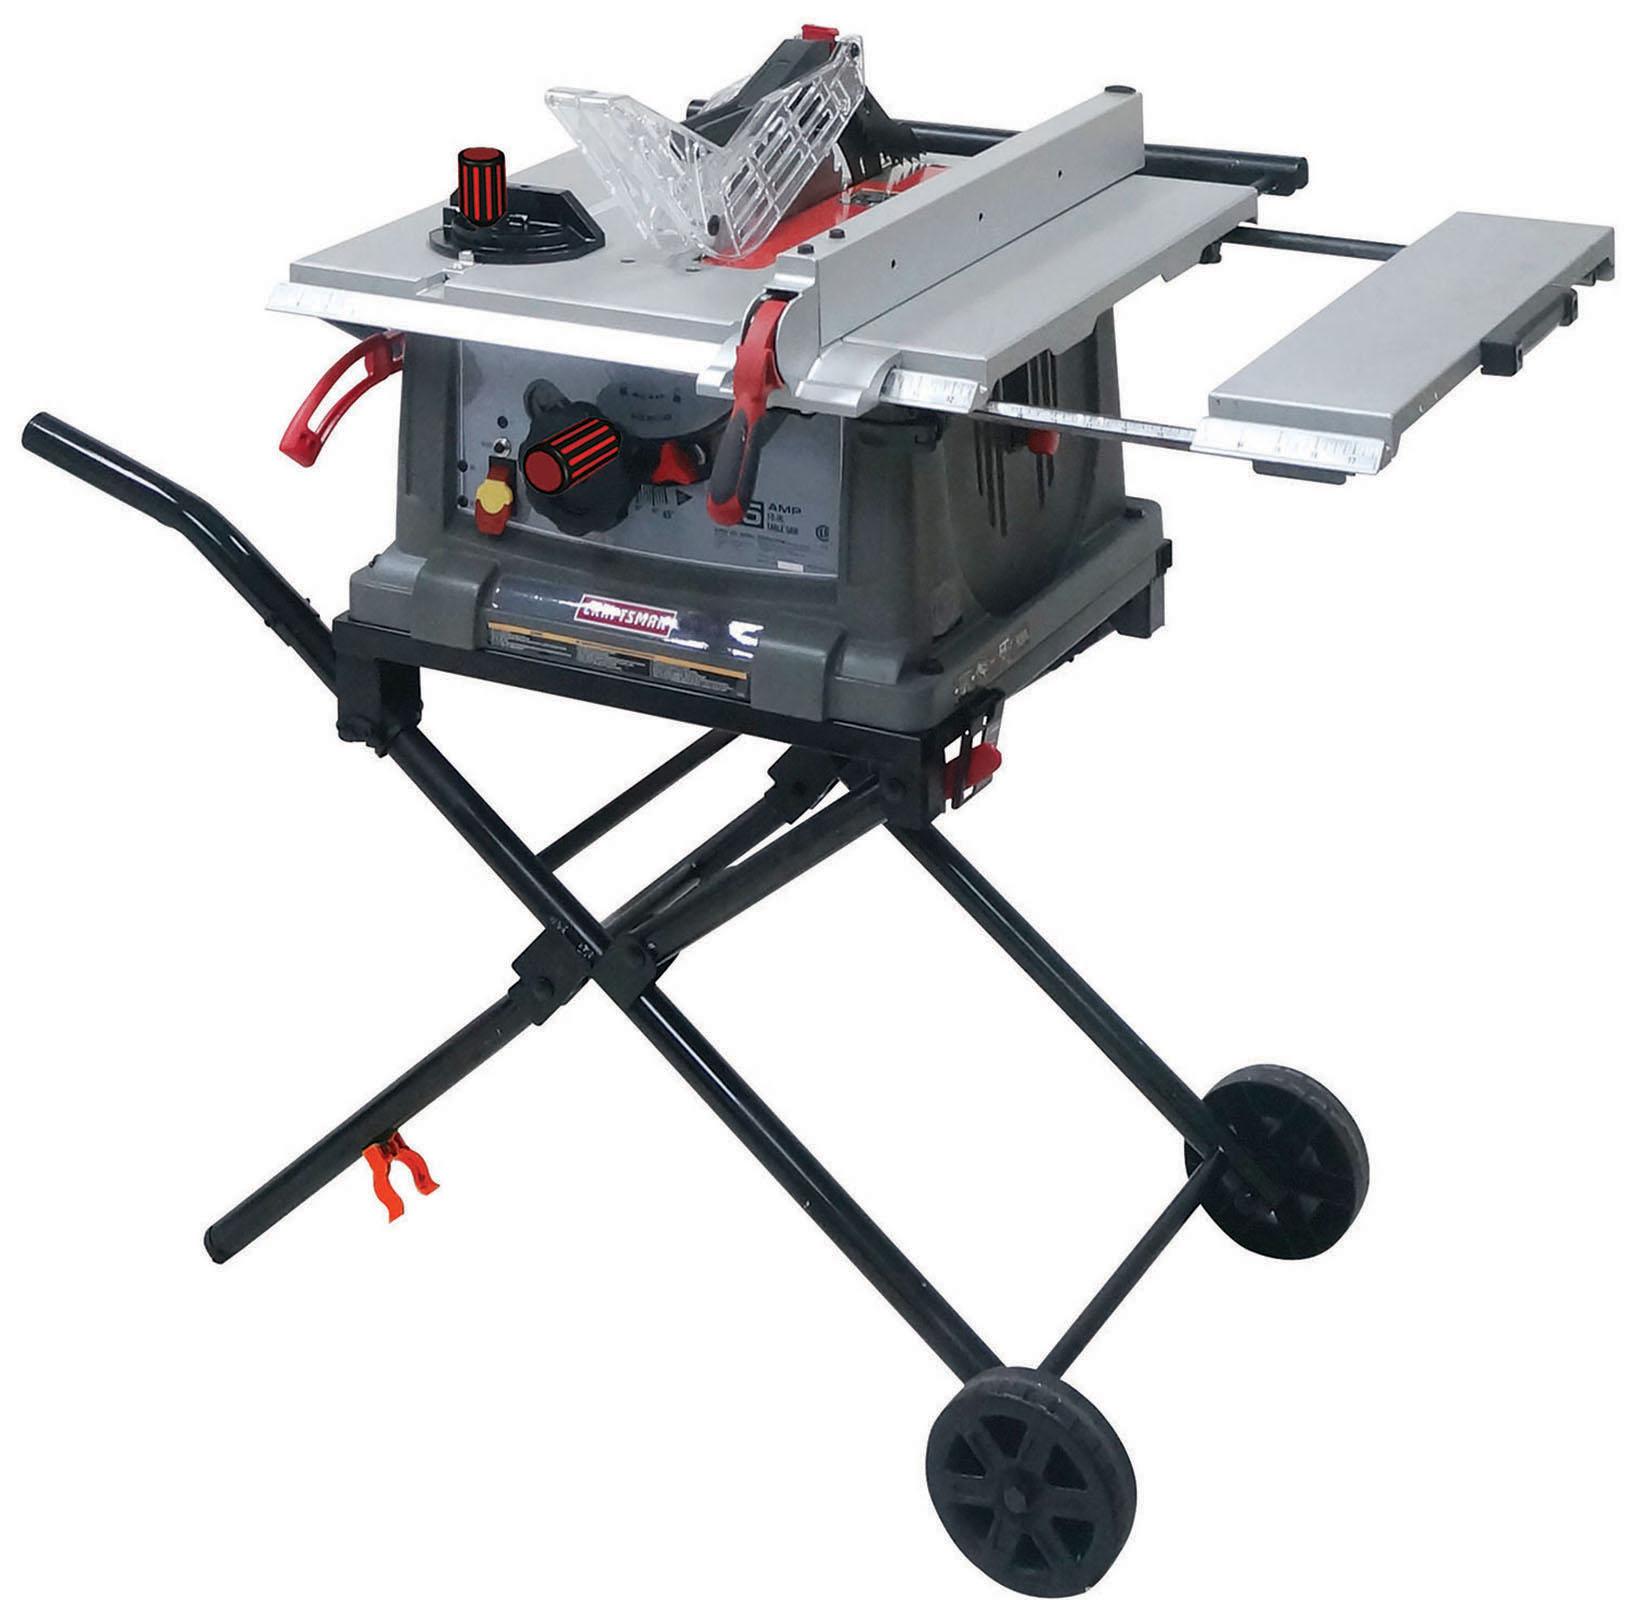 craftsman table saws craftsman table saw model 137 wiring diagram for craftsman table saw 137 248830 [ 1625 x 1600 Pixel ]